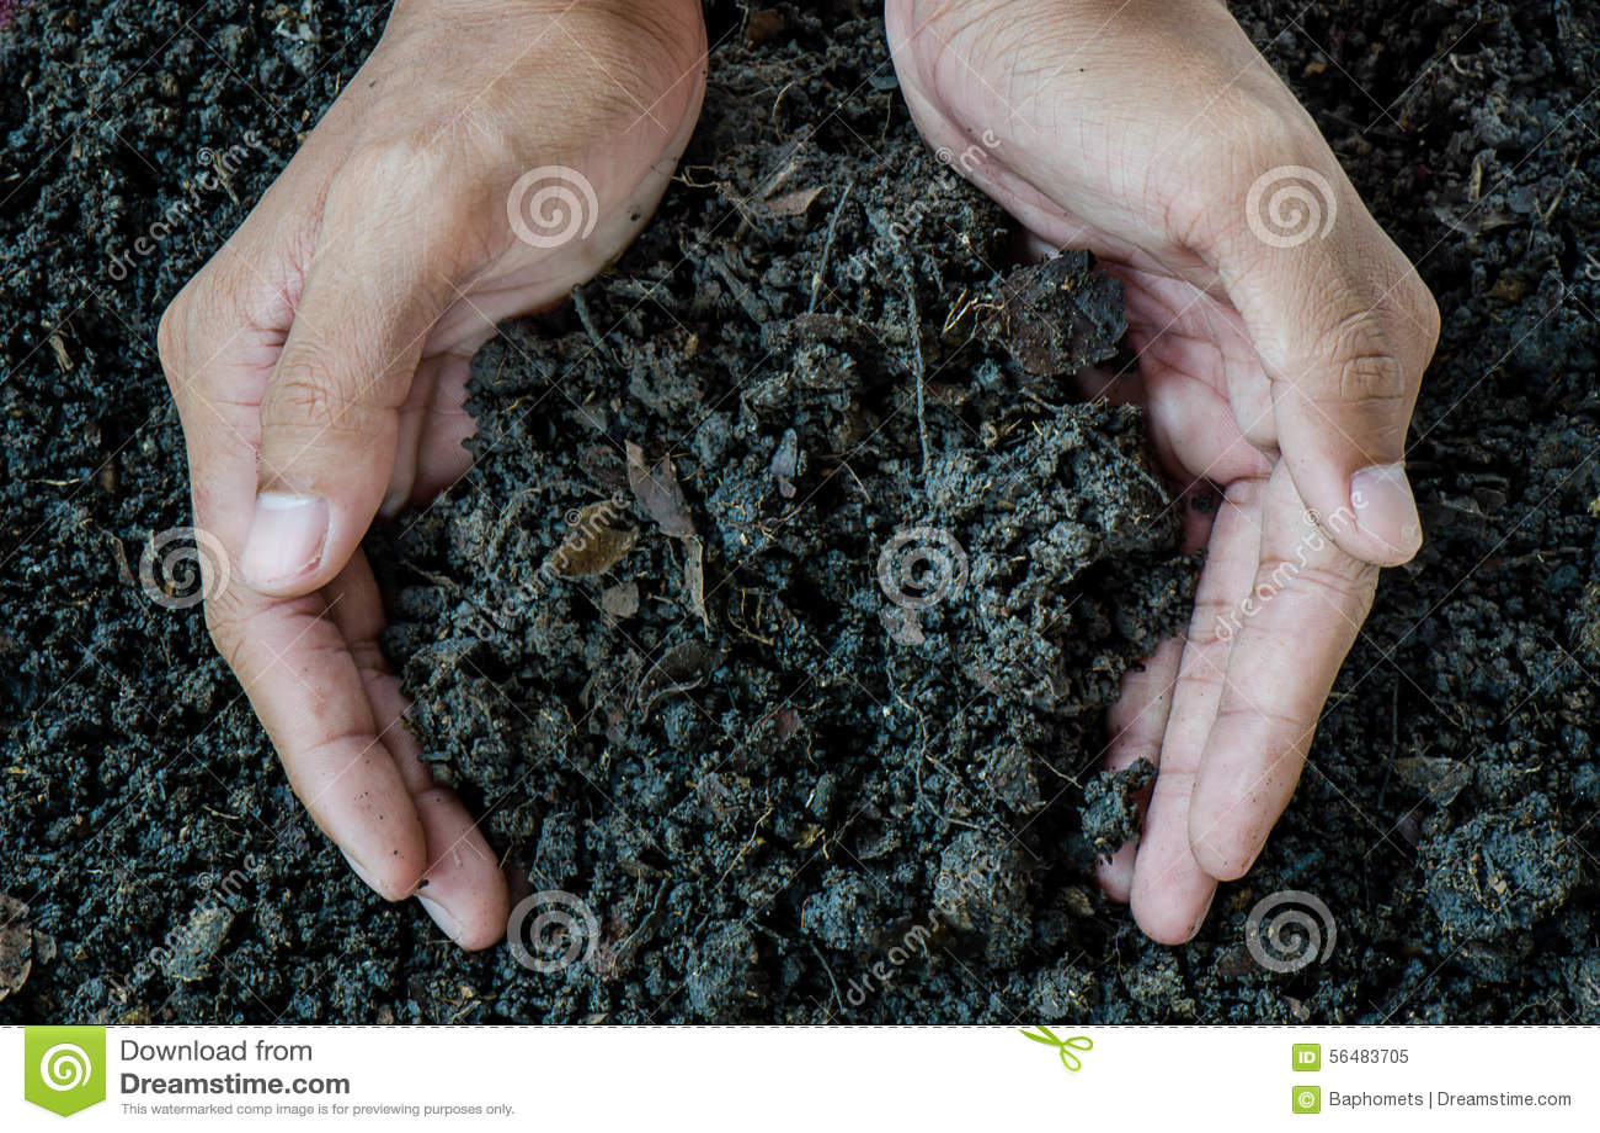 Hands holding soil, Organic fertilizer